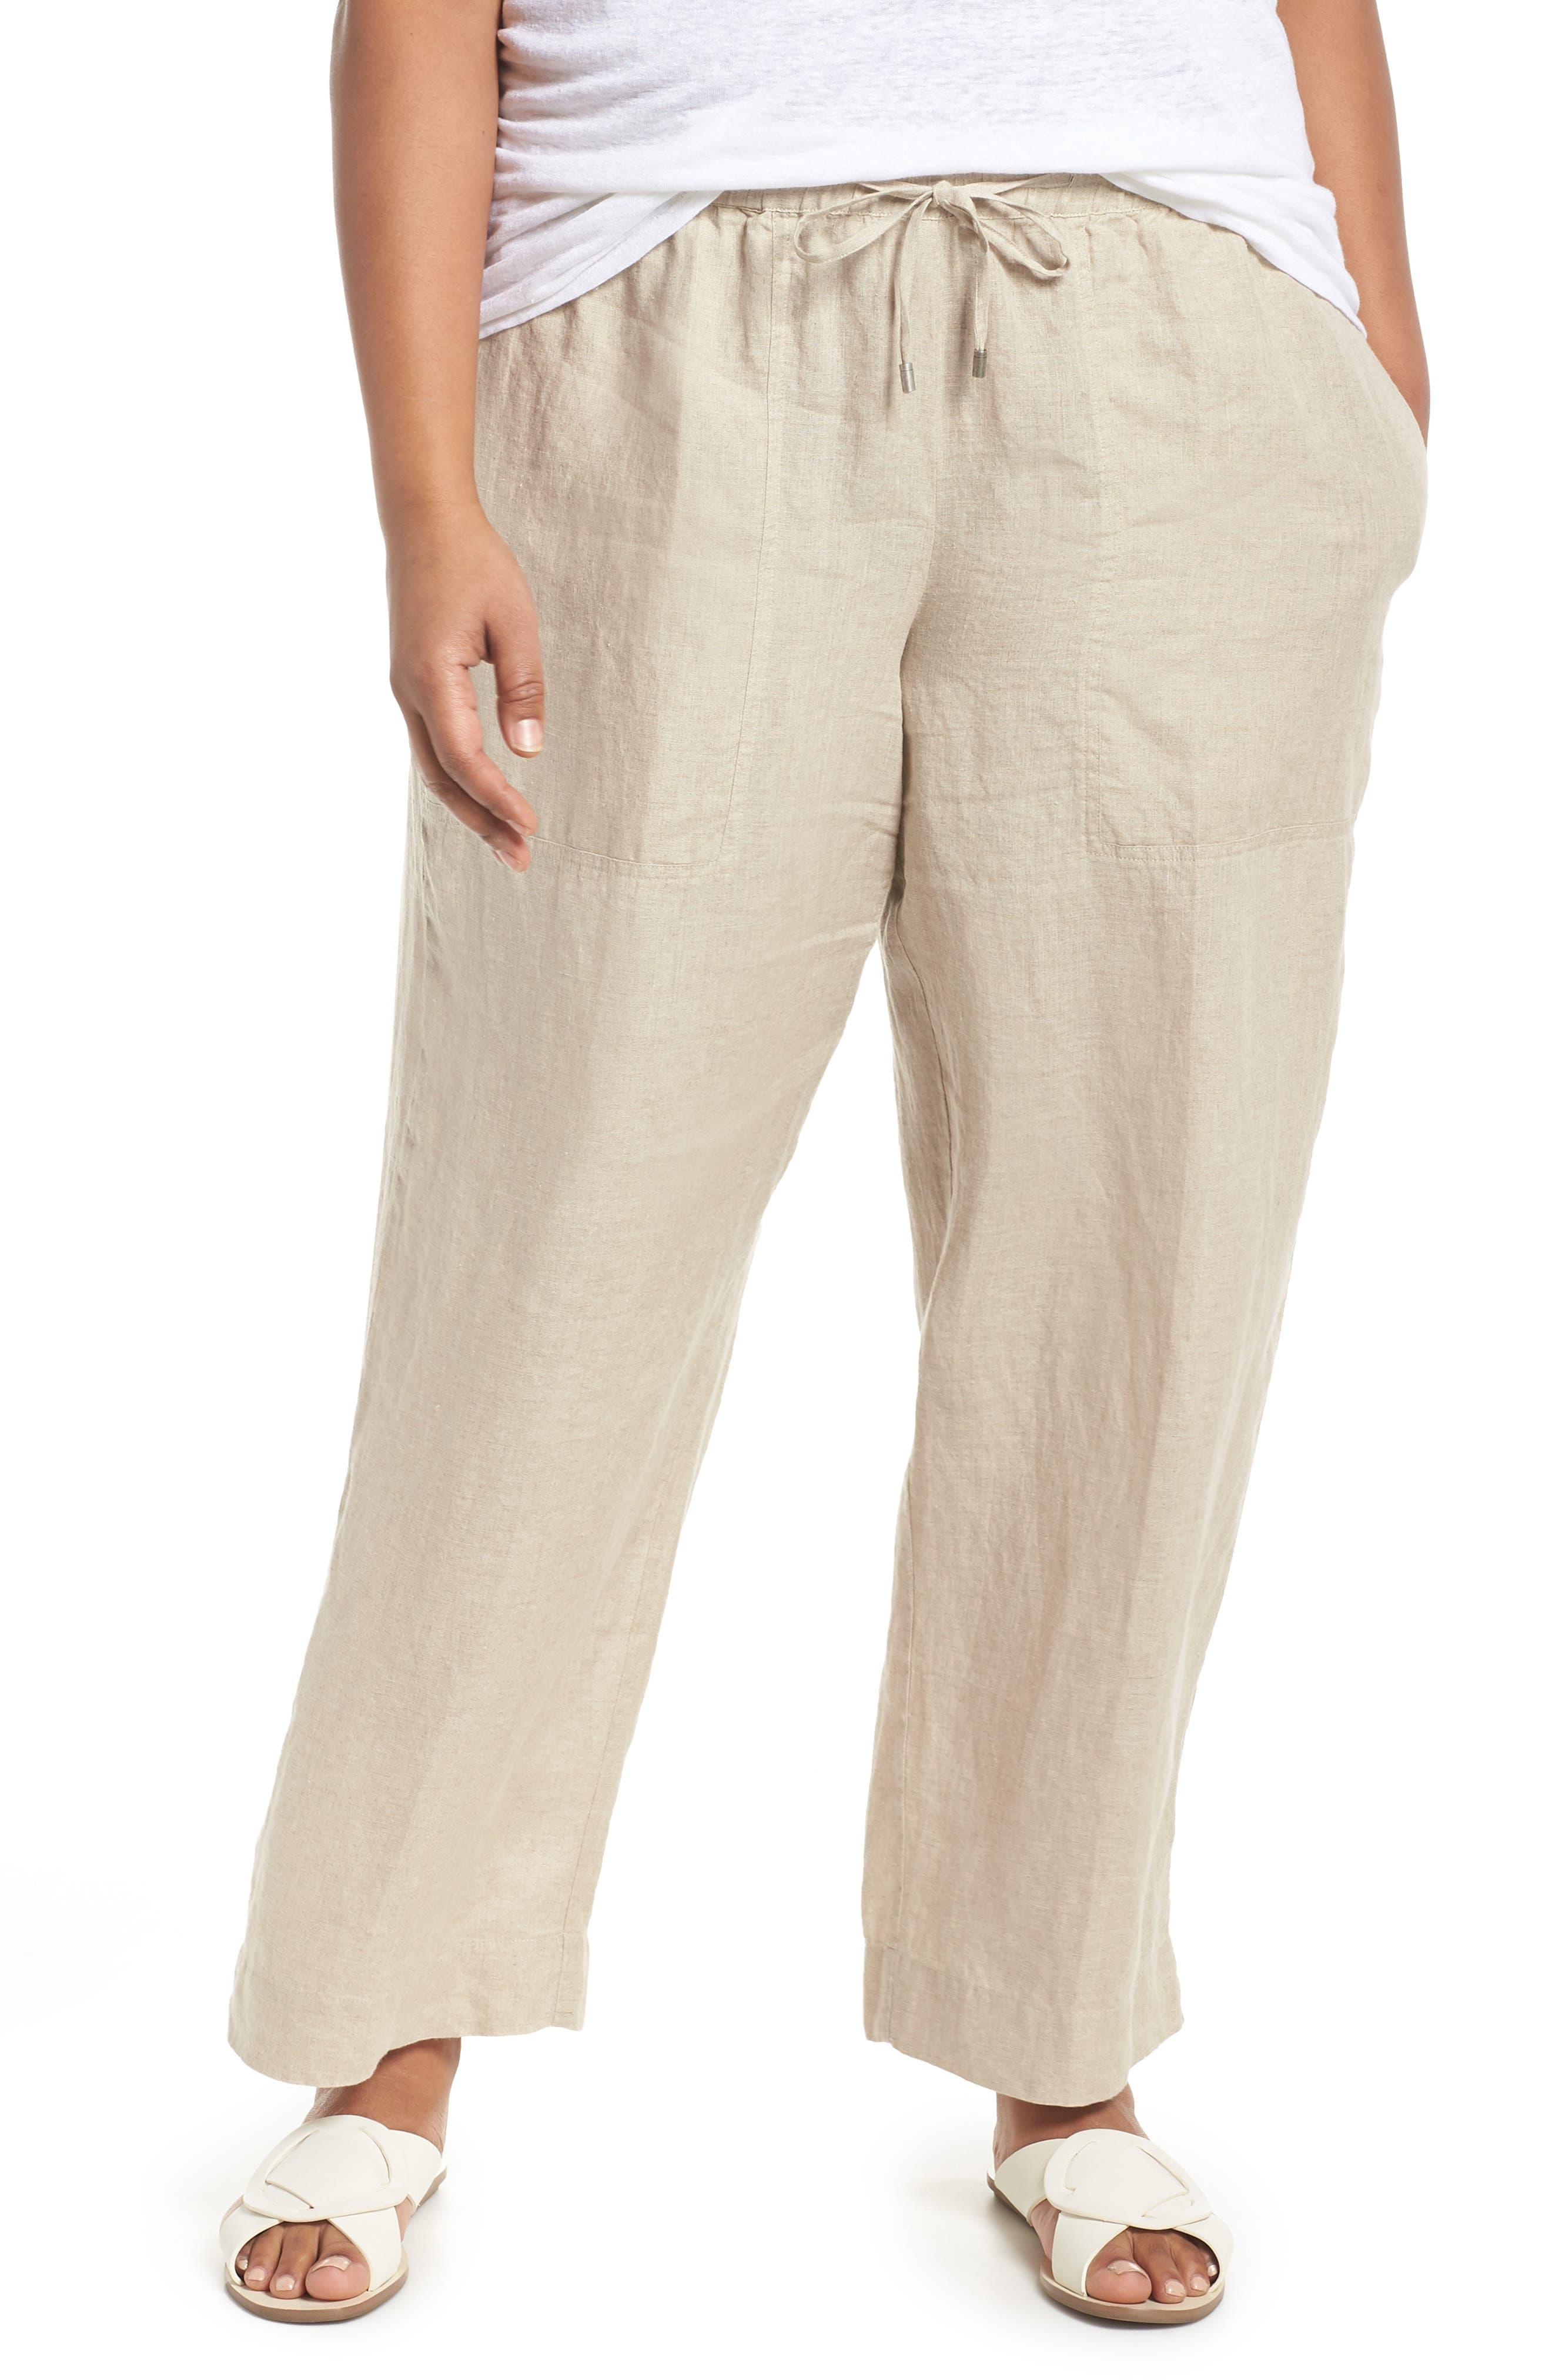 Organic Linen Ankle Pants,                         Main,                         color, Undyed Natural